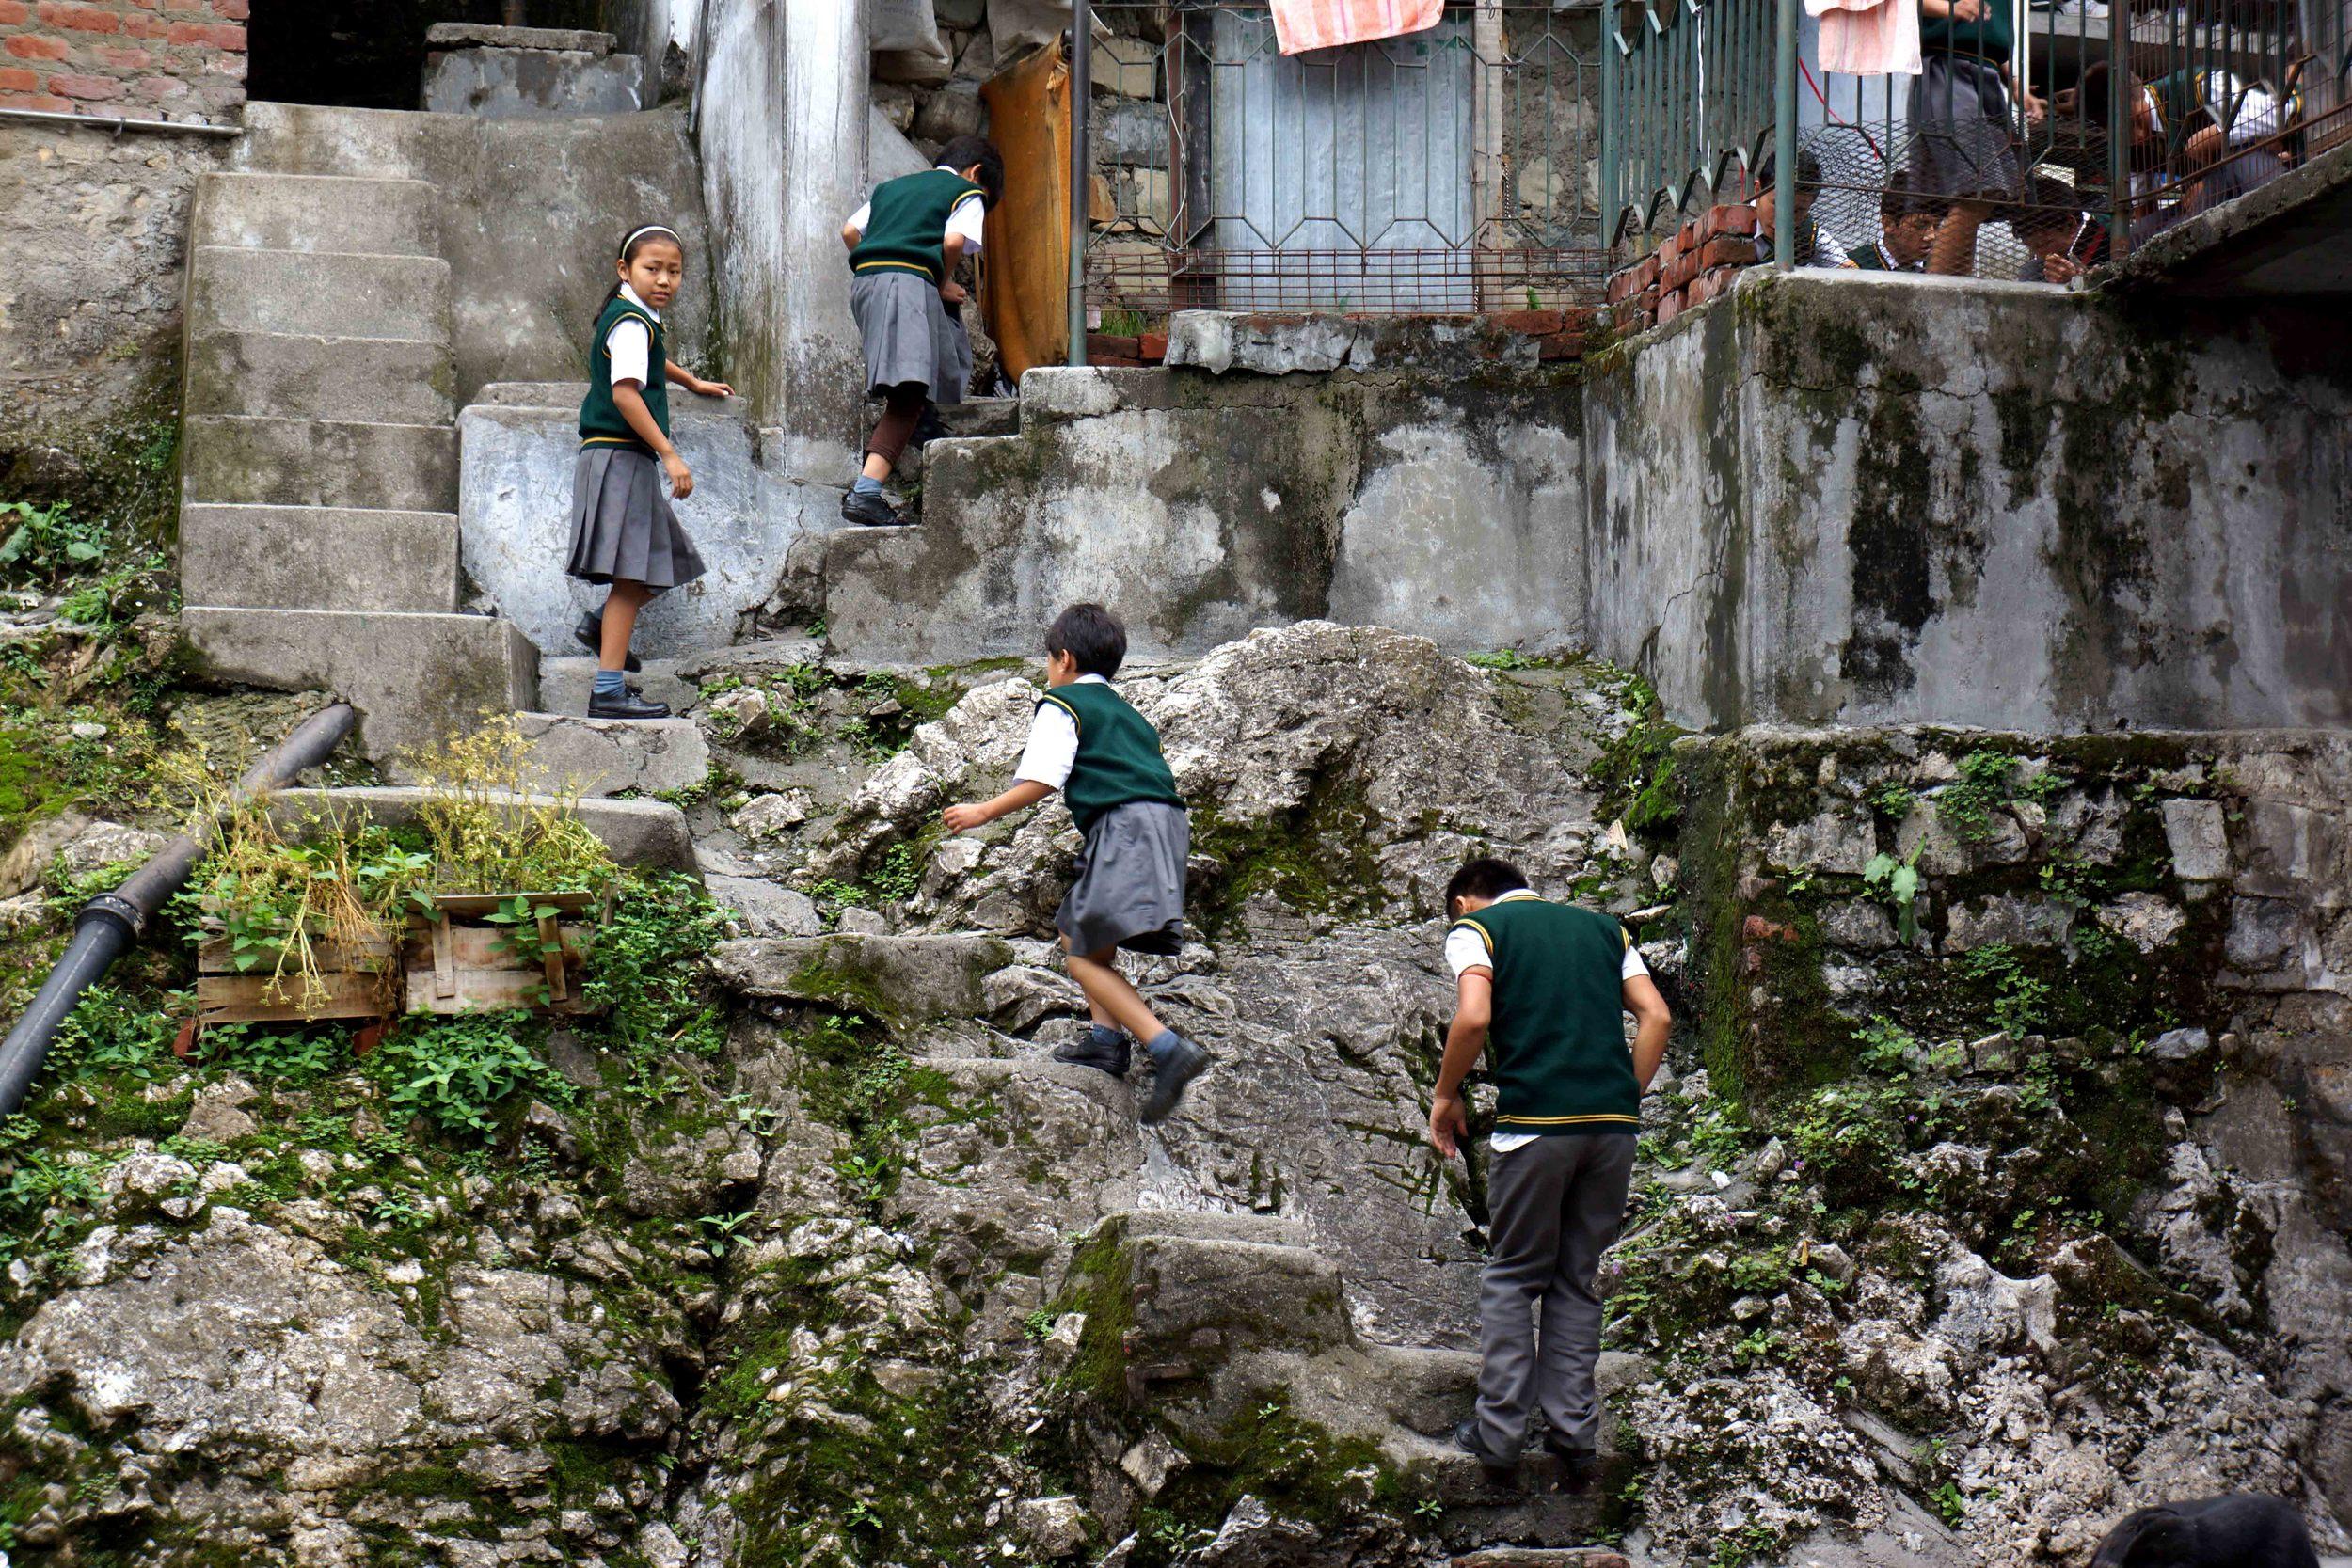 Image of Tibetan schoolchildren climbing stairs